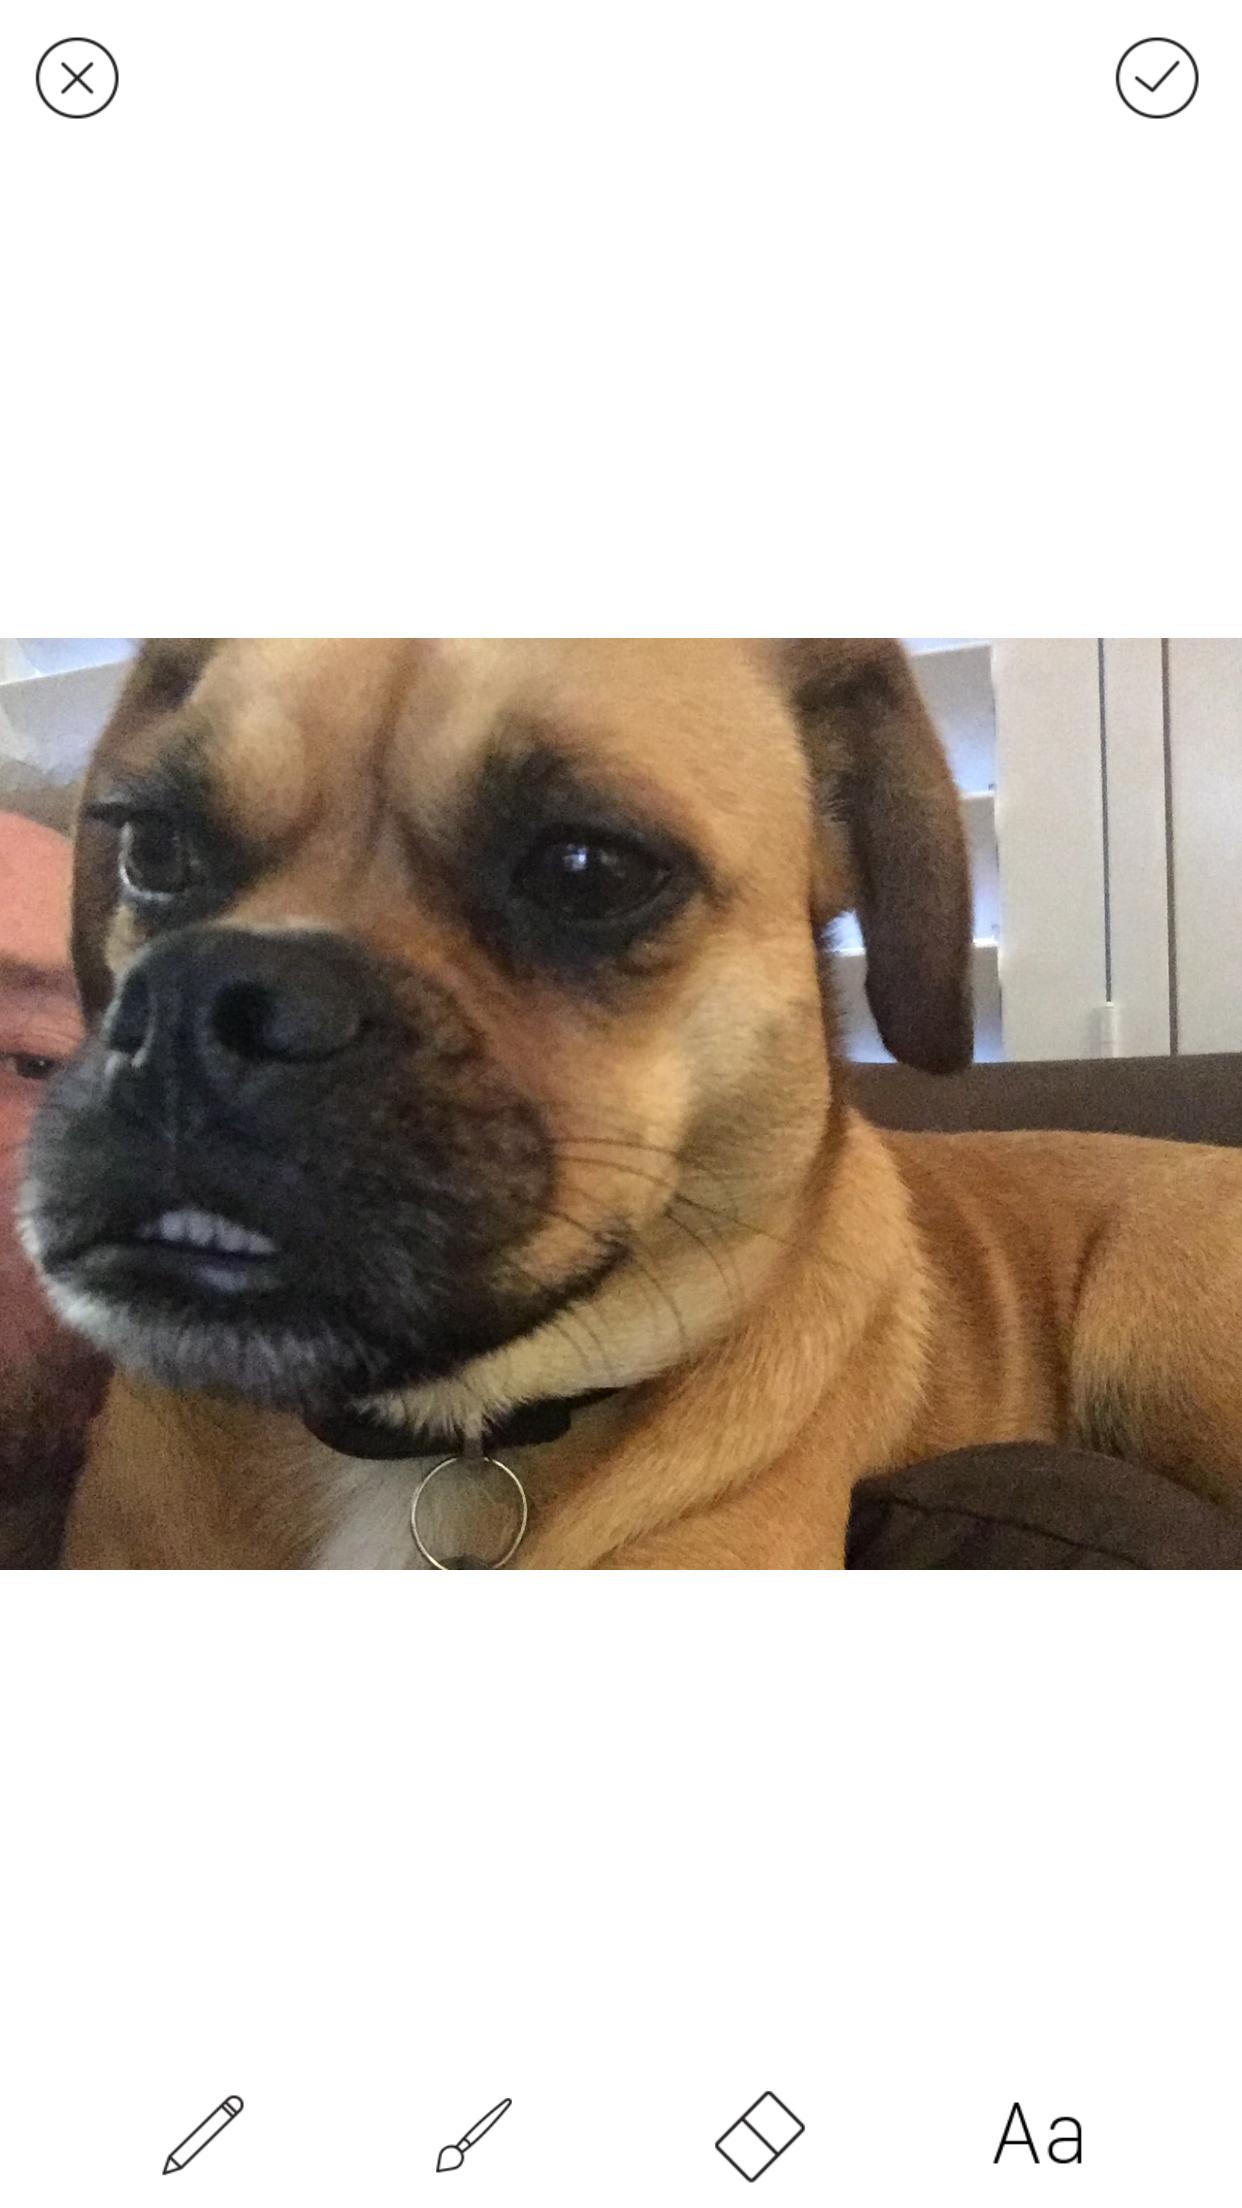 rosie dog story editor screenshot